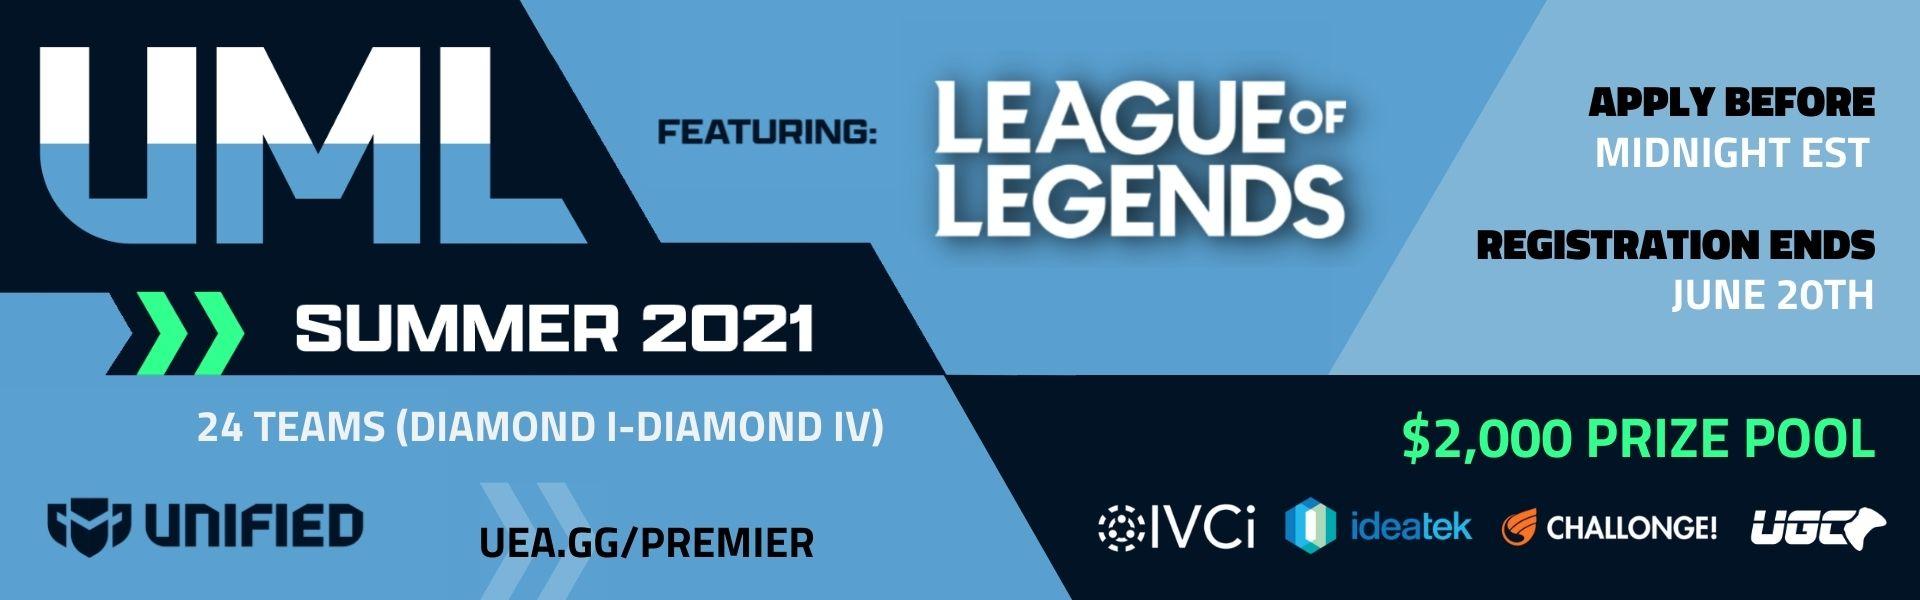 Upsurge Minor League - League of Legends - Summer 2021